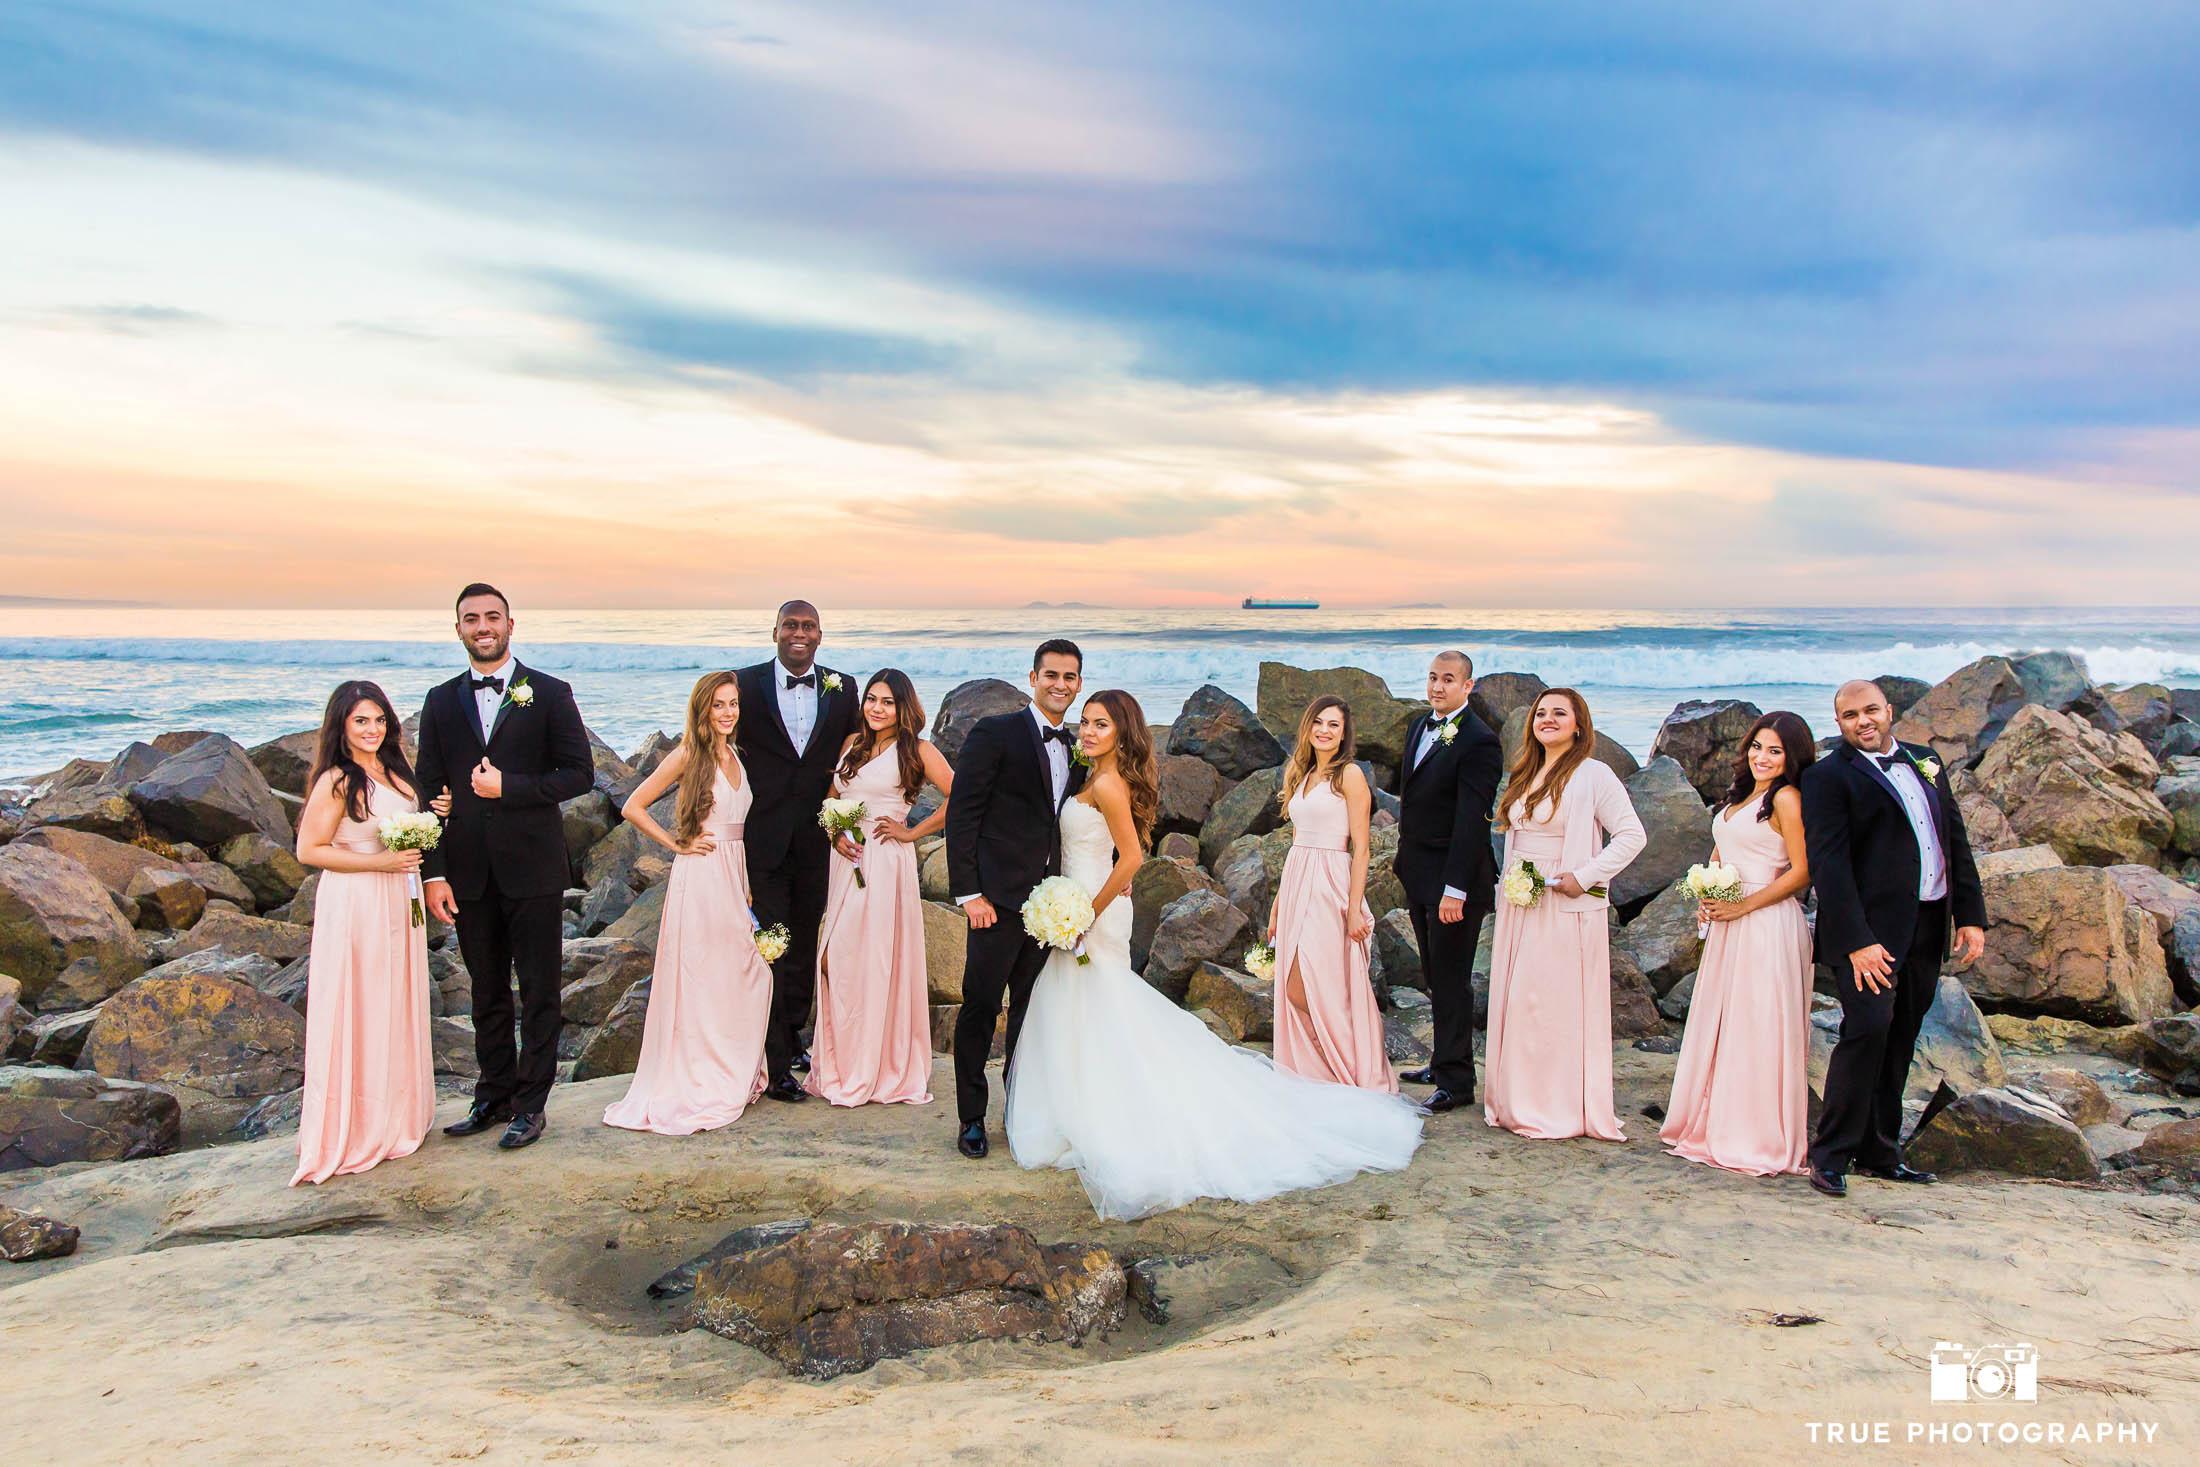 Bridal party with wedding couple on rocks at Coronado Beach